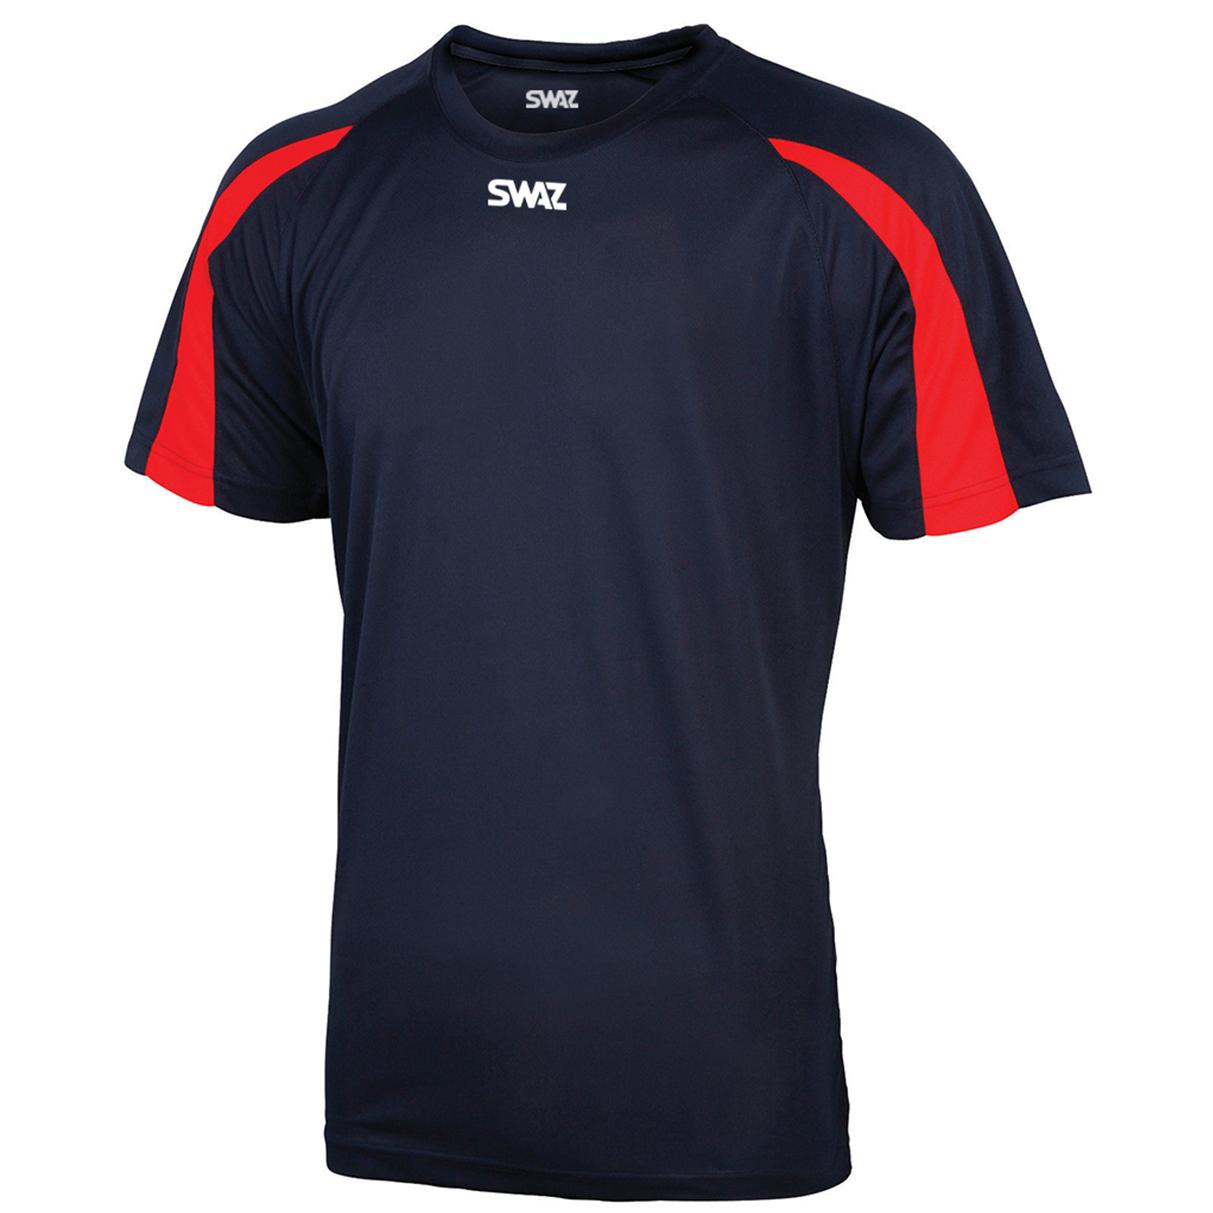 SWAZ Premier Training T-Shirt – Navy/Red